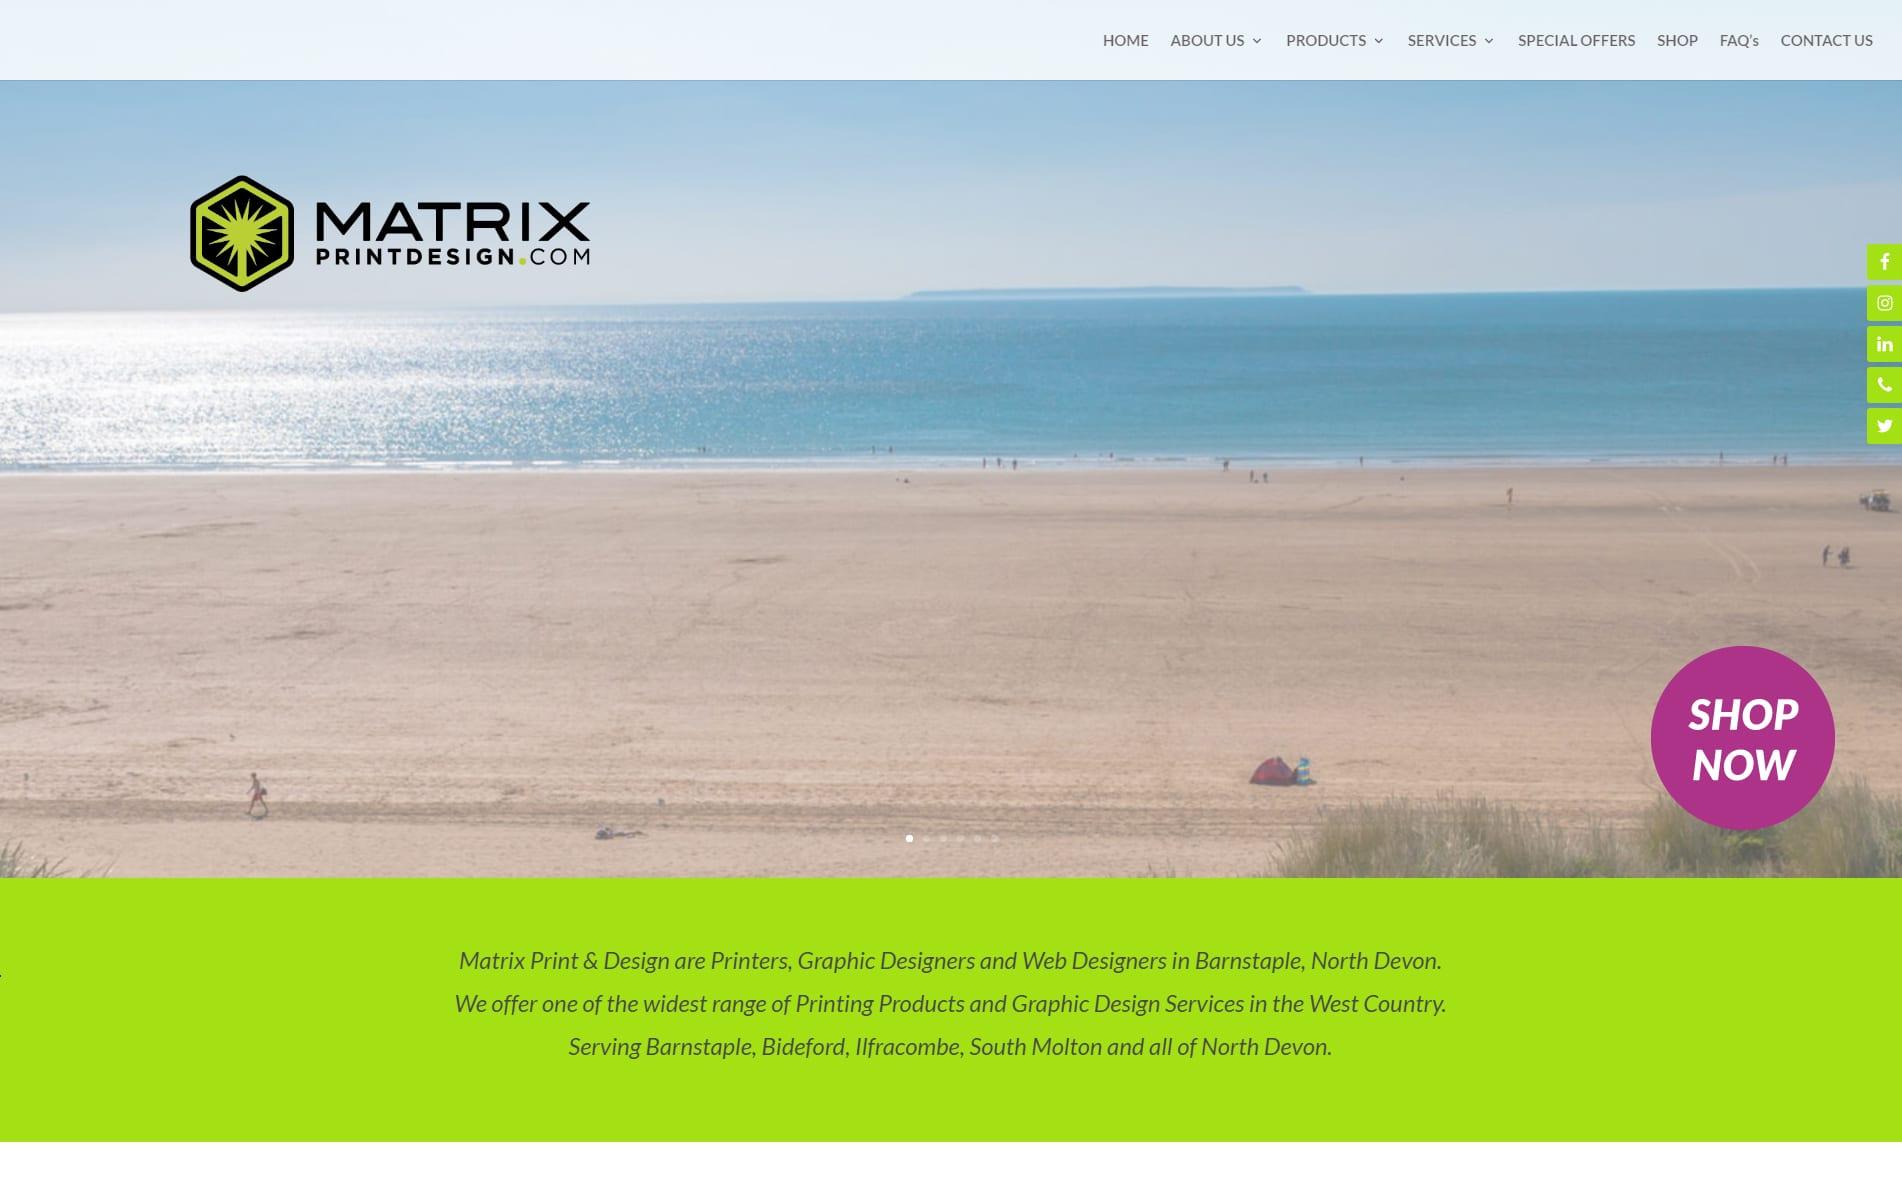 MATRIX-HOME-PORTFOLIO